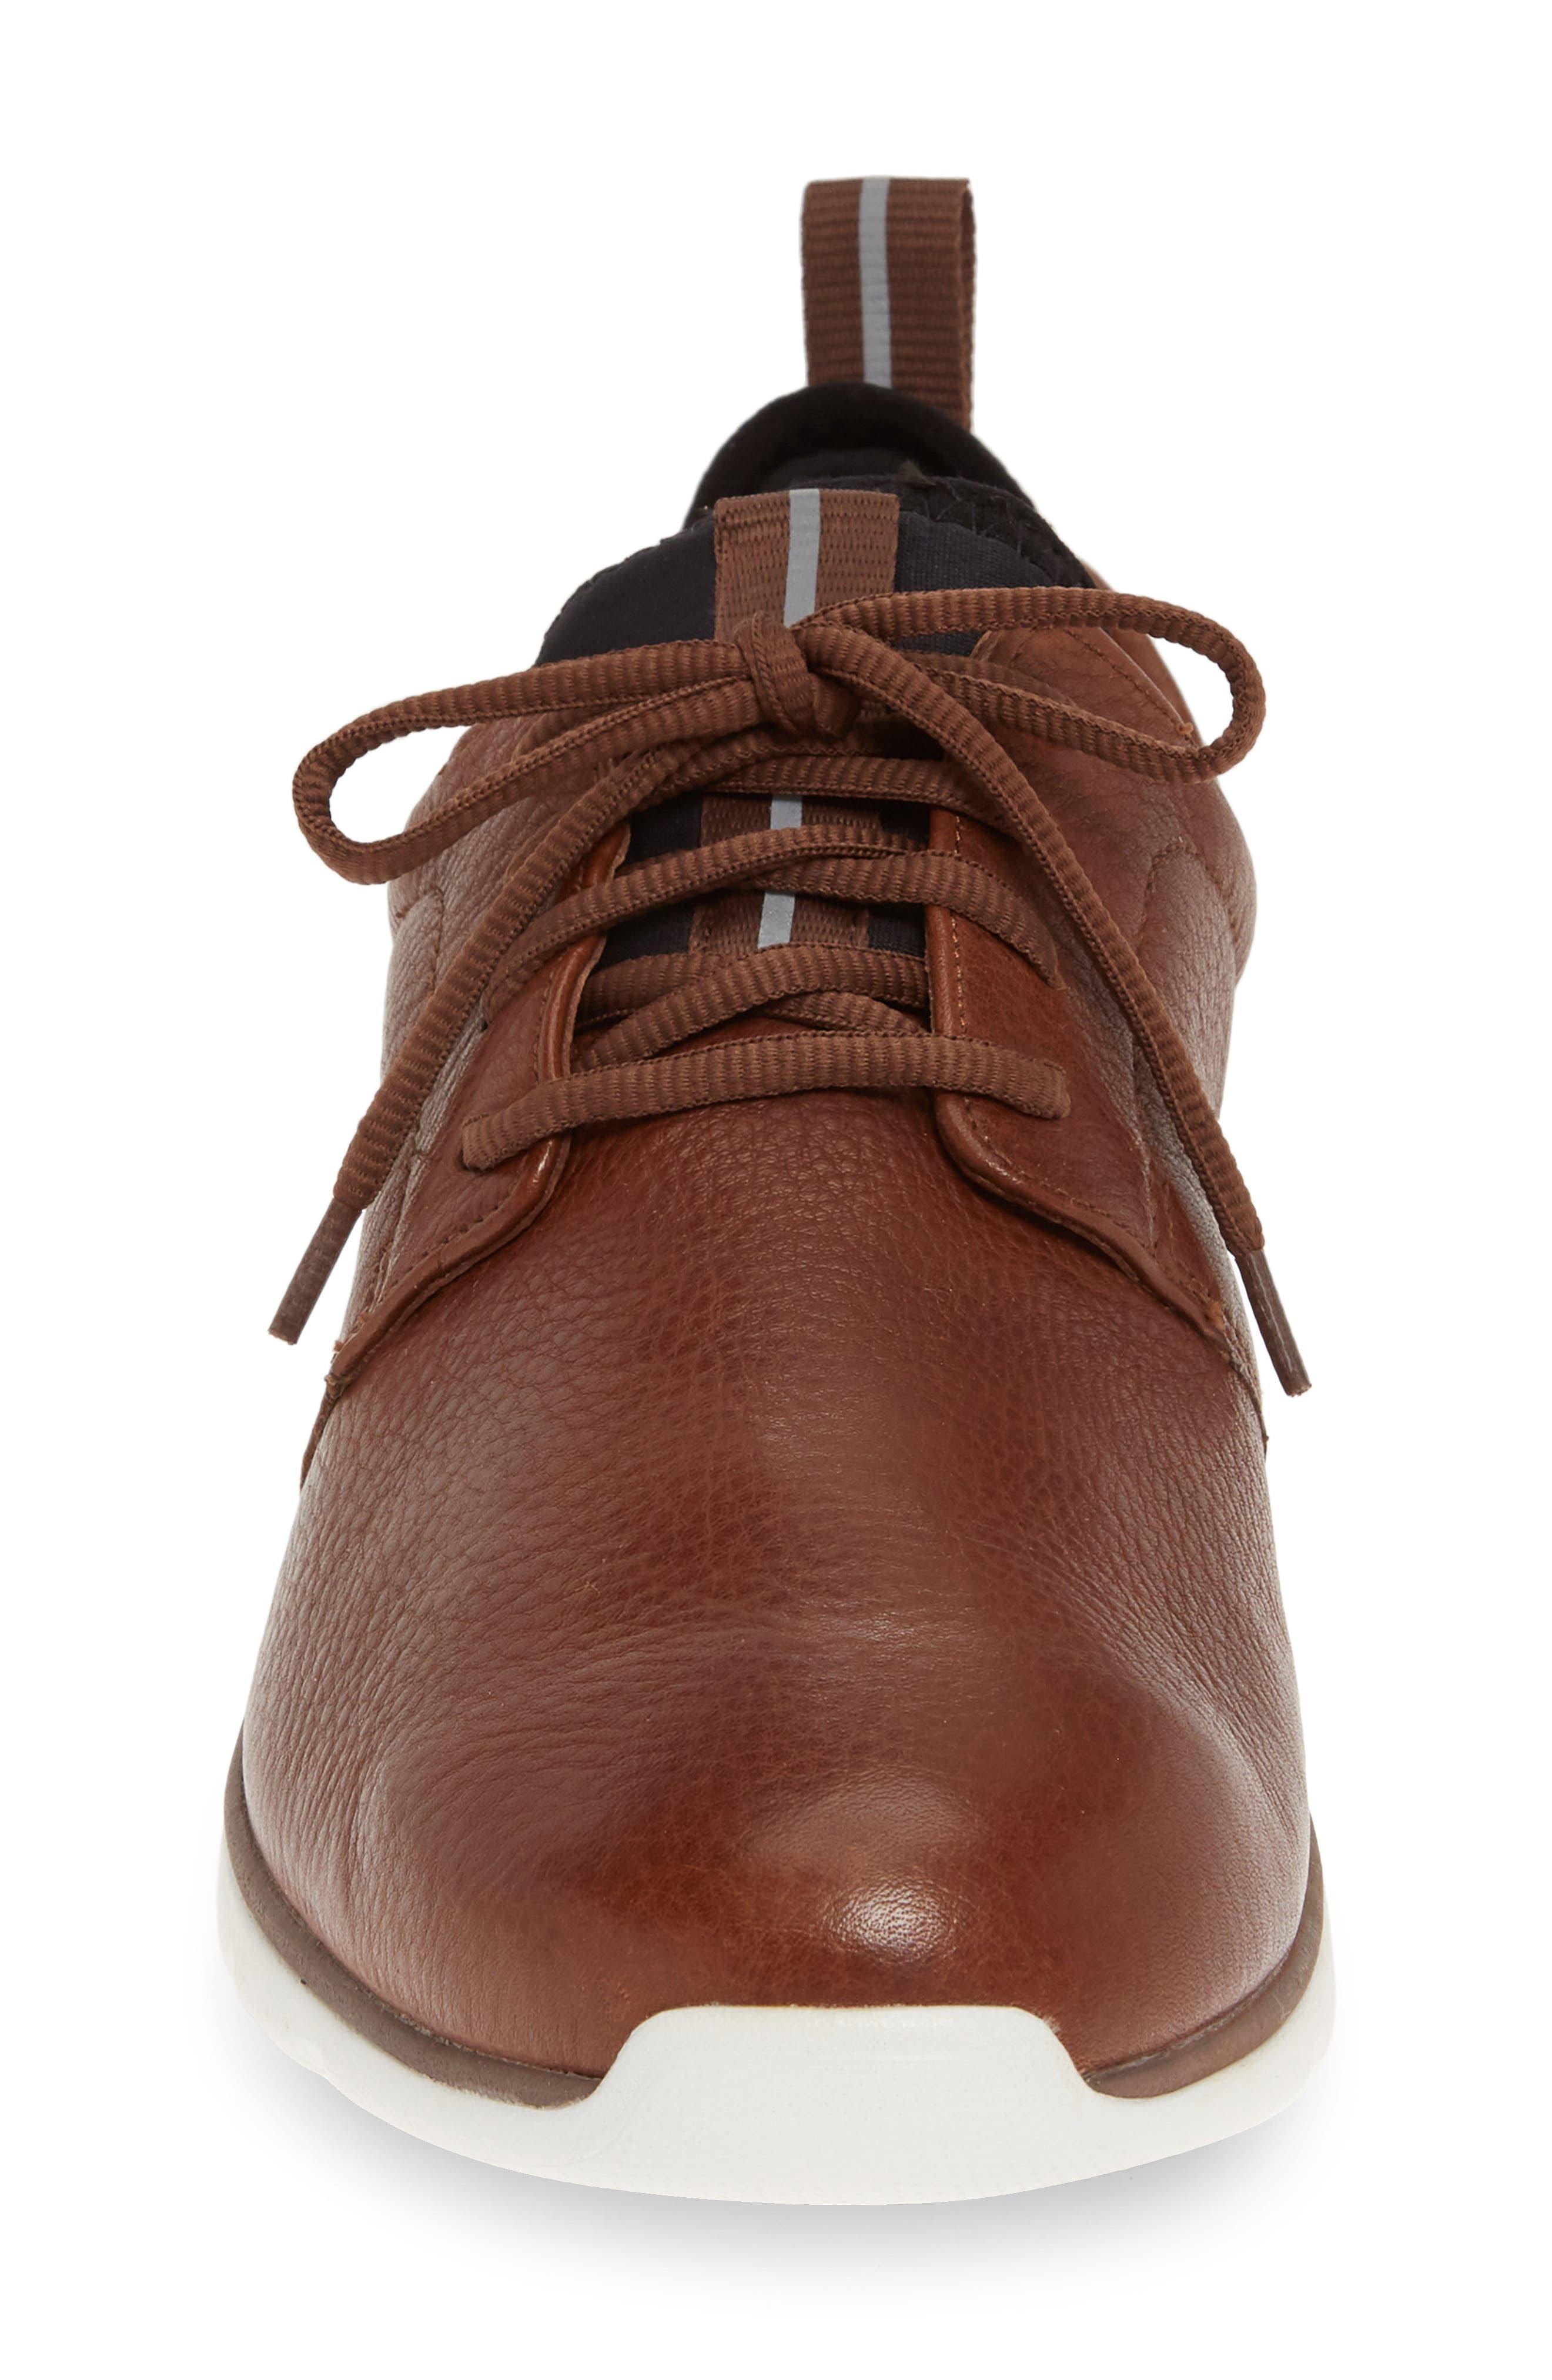 JOHNSTON & MURPHY, Prentiss XC4<sup>®</sup> Waterproof Low Top Sneaker, Alternate thumbnail 4, color, MAHOGANY LEATHER